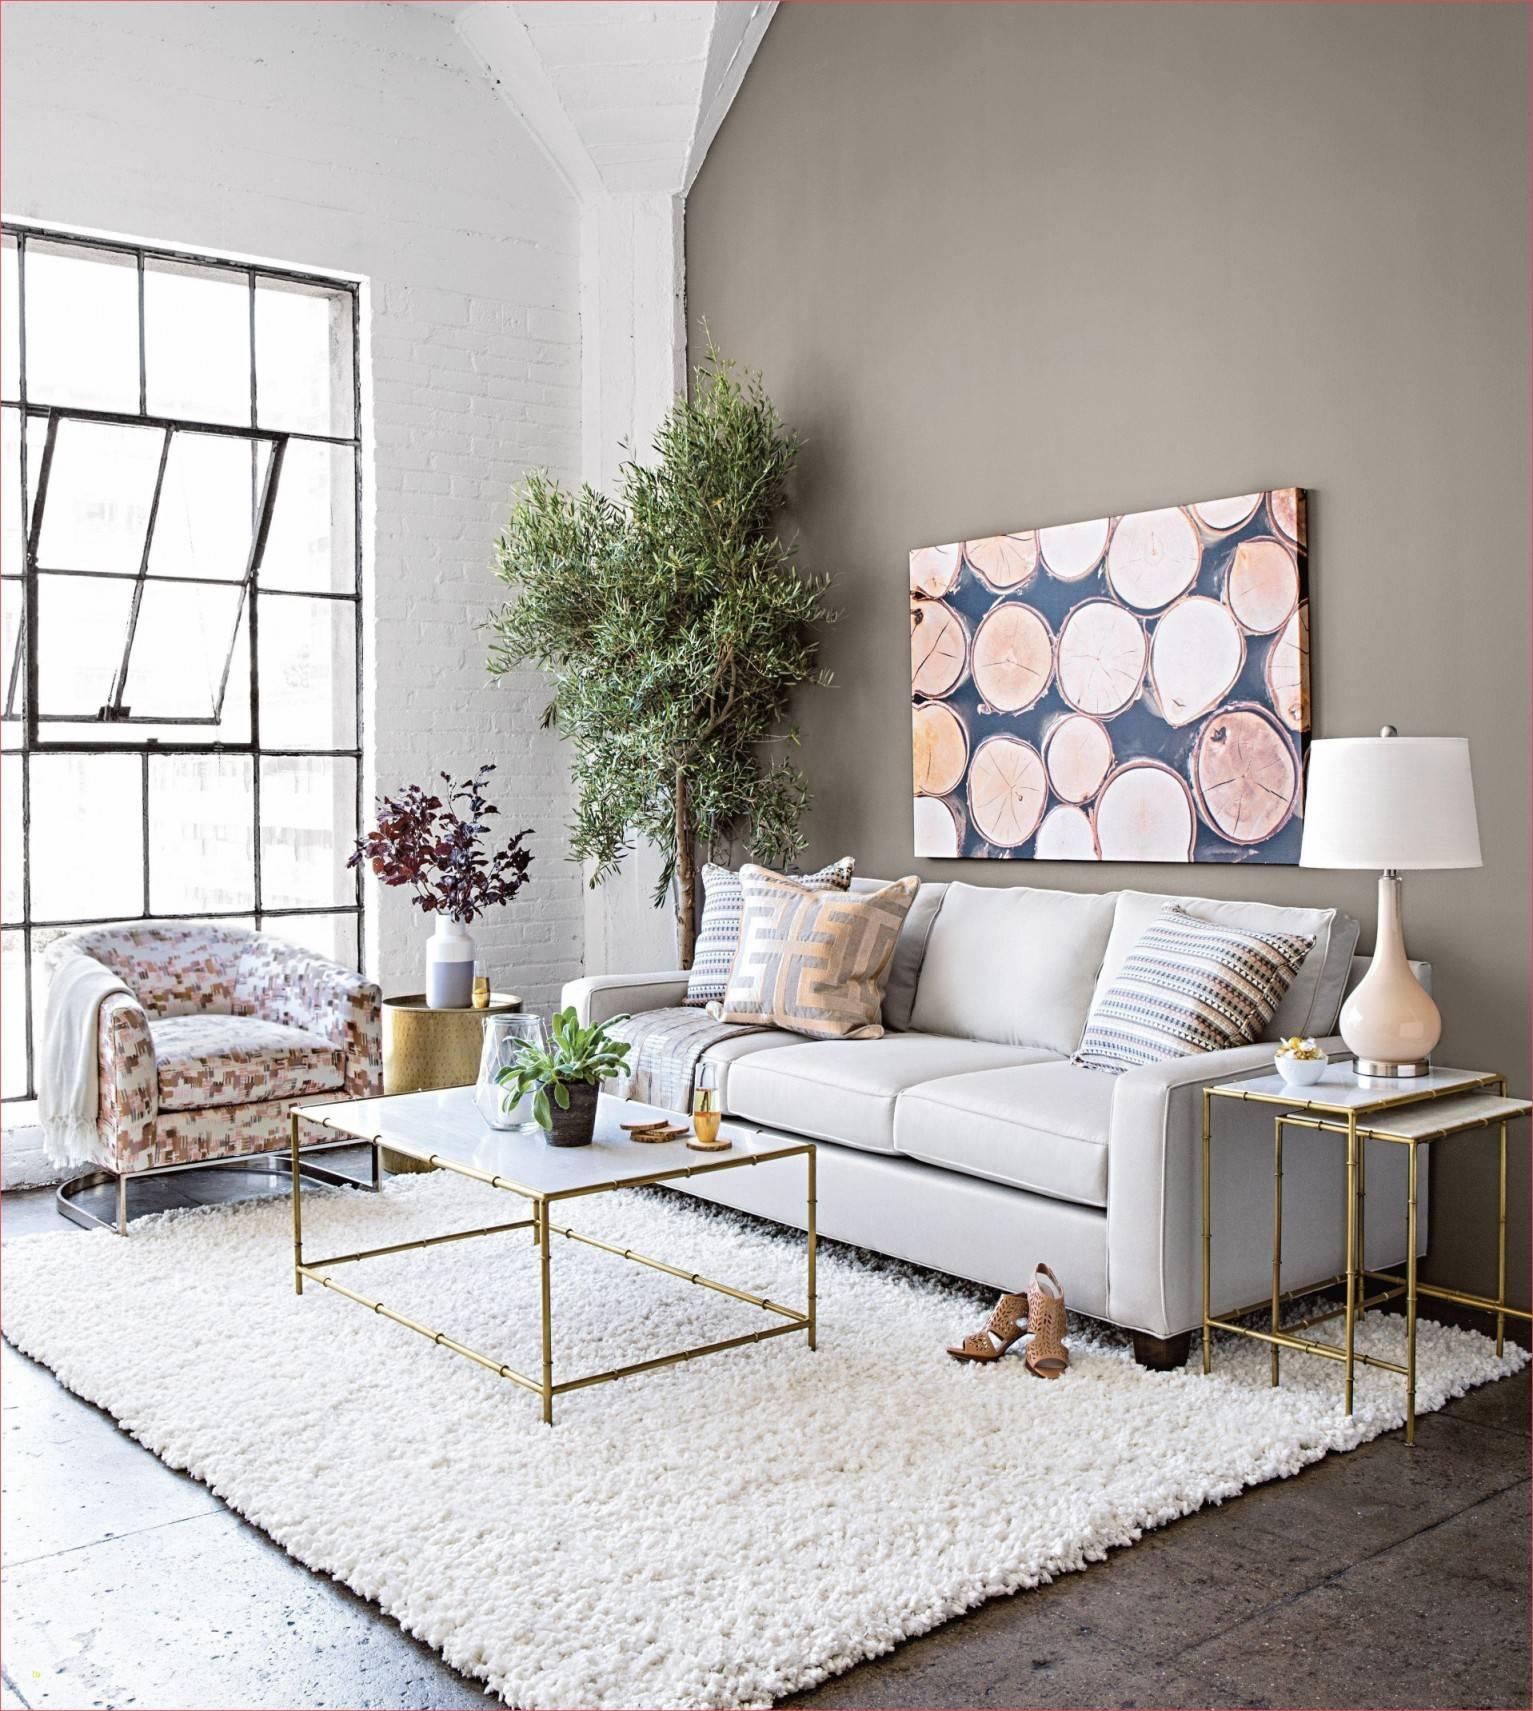 cabinets for living room designs unique latest tv unit design ajjtimes of cabinets for living room designs